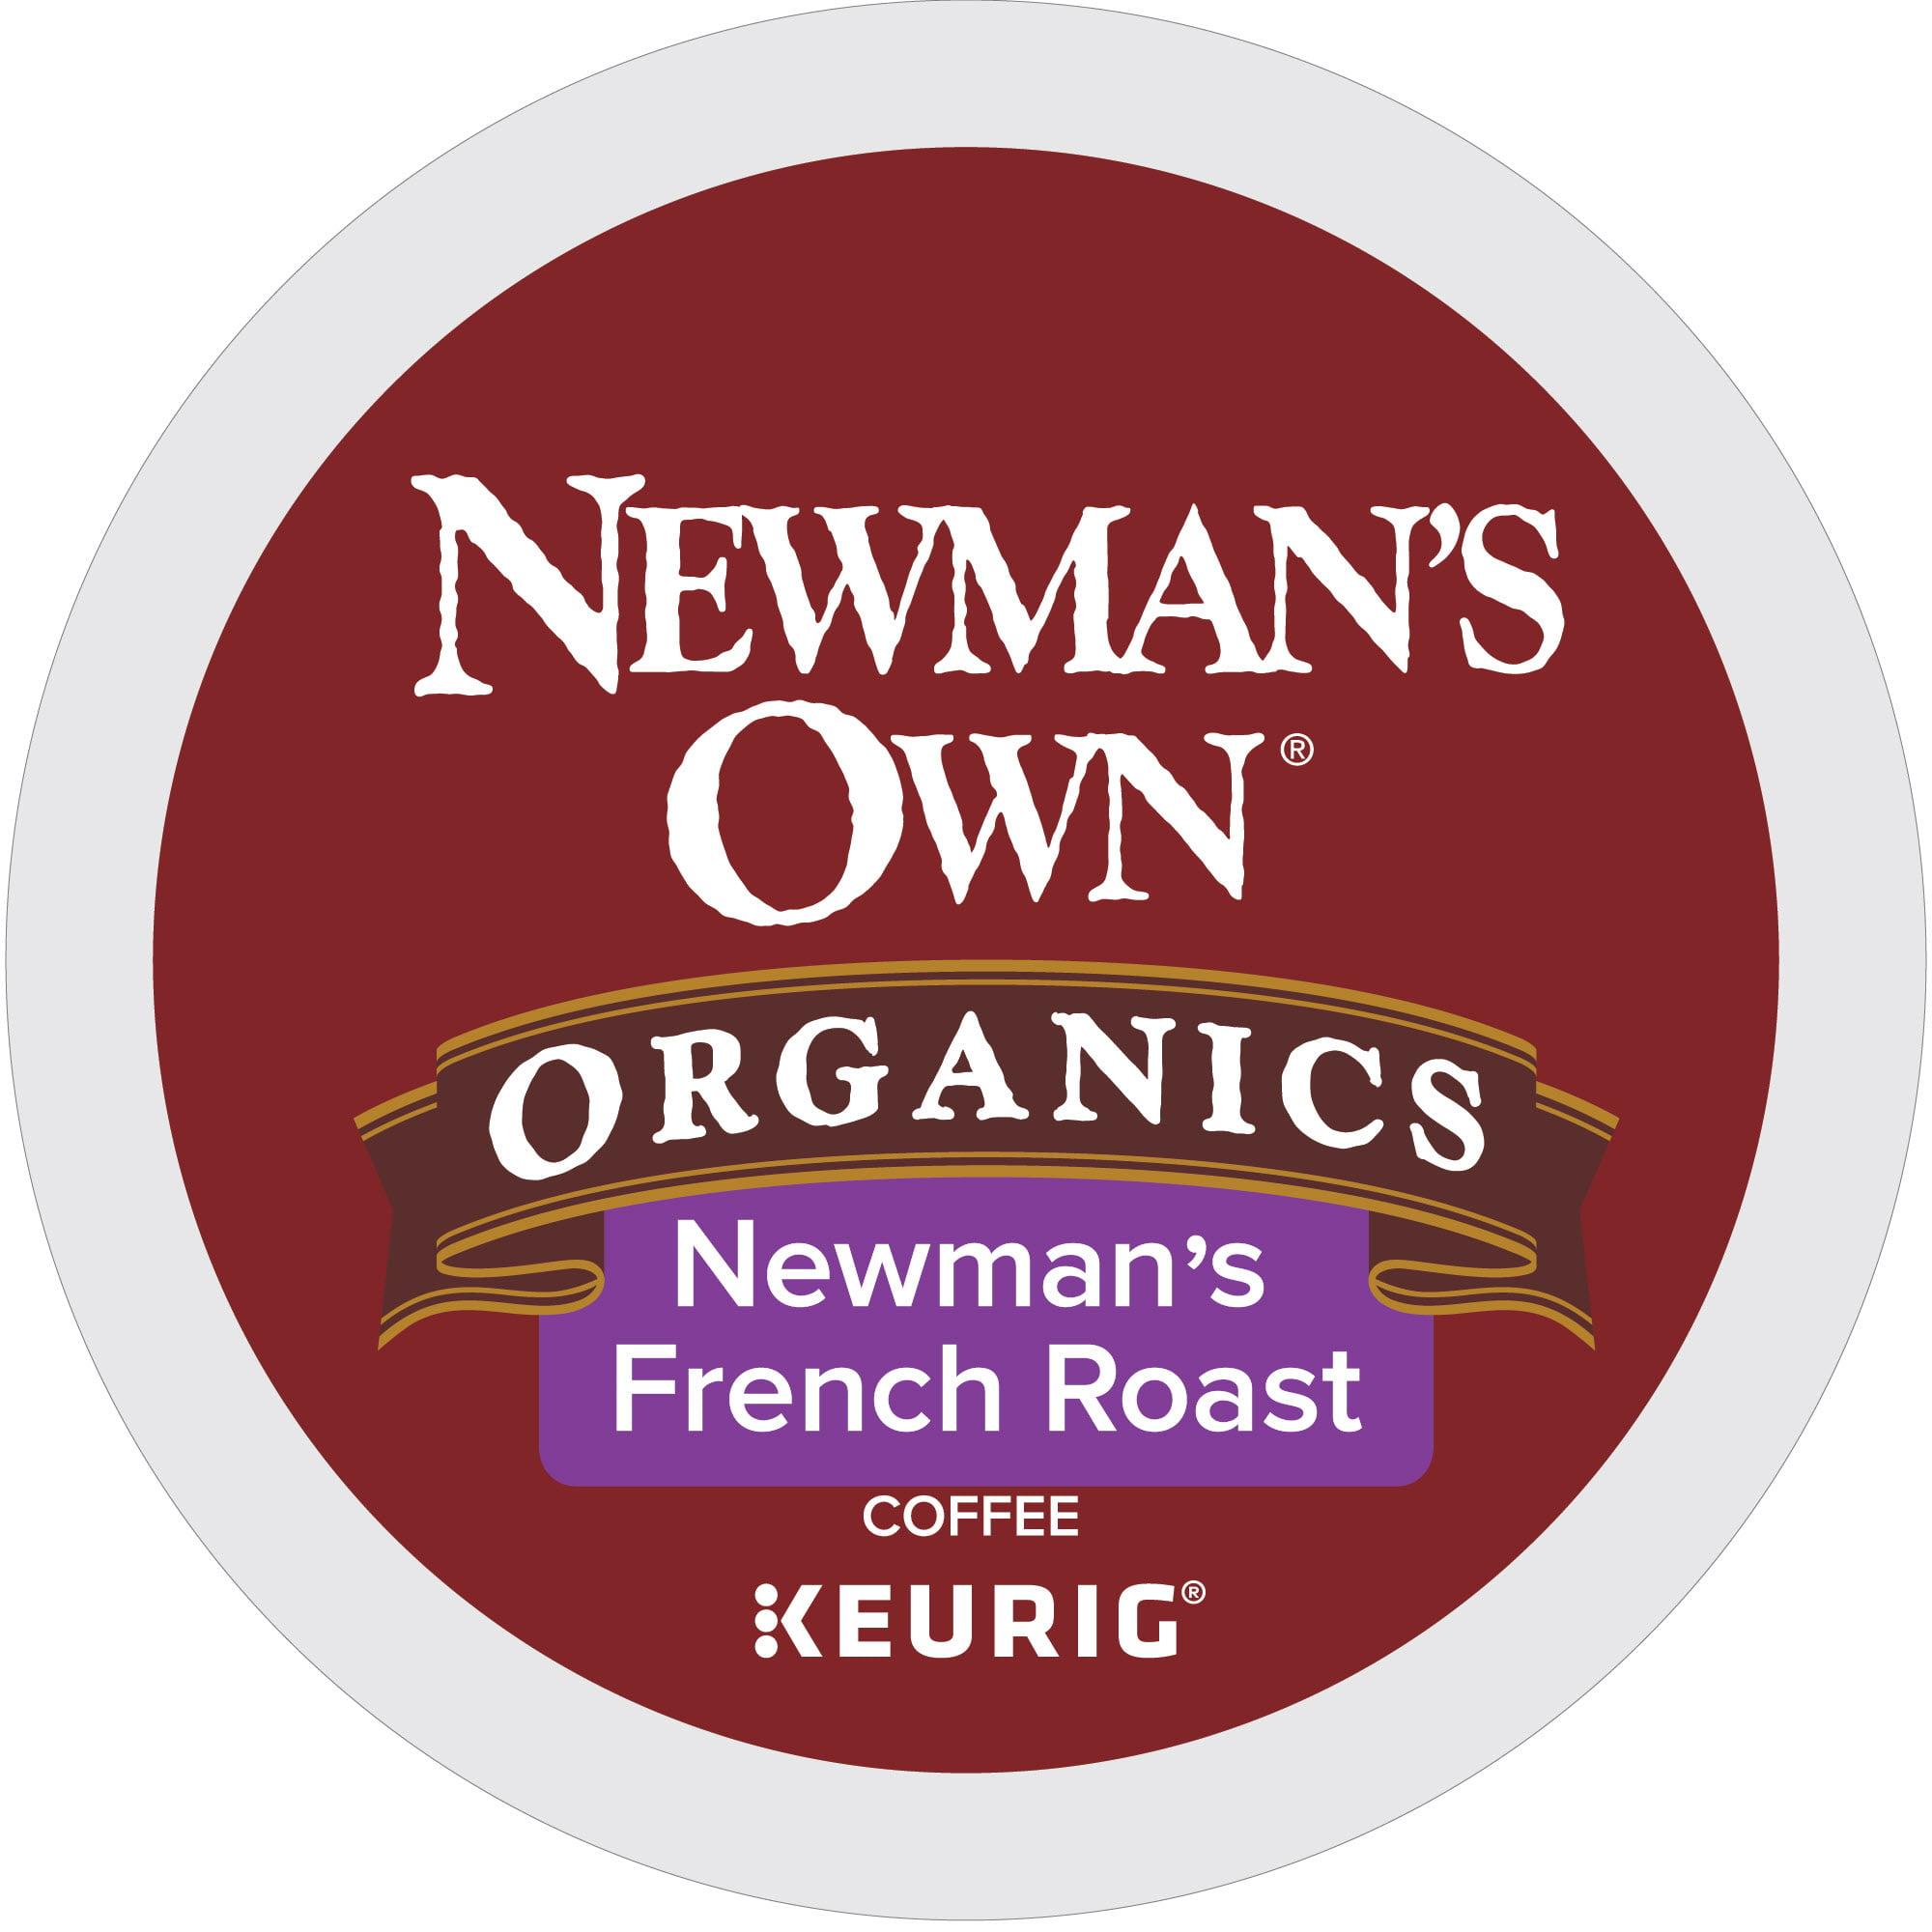 (4 Pack) Newman's Own Organics French Roast, Coffee Keurig K-Cup Pods, Dark Roast, 18 Count